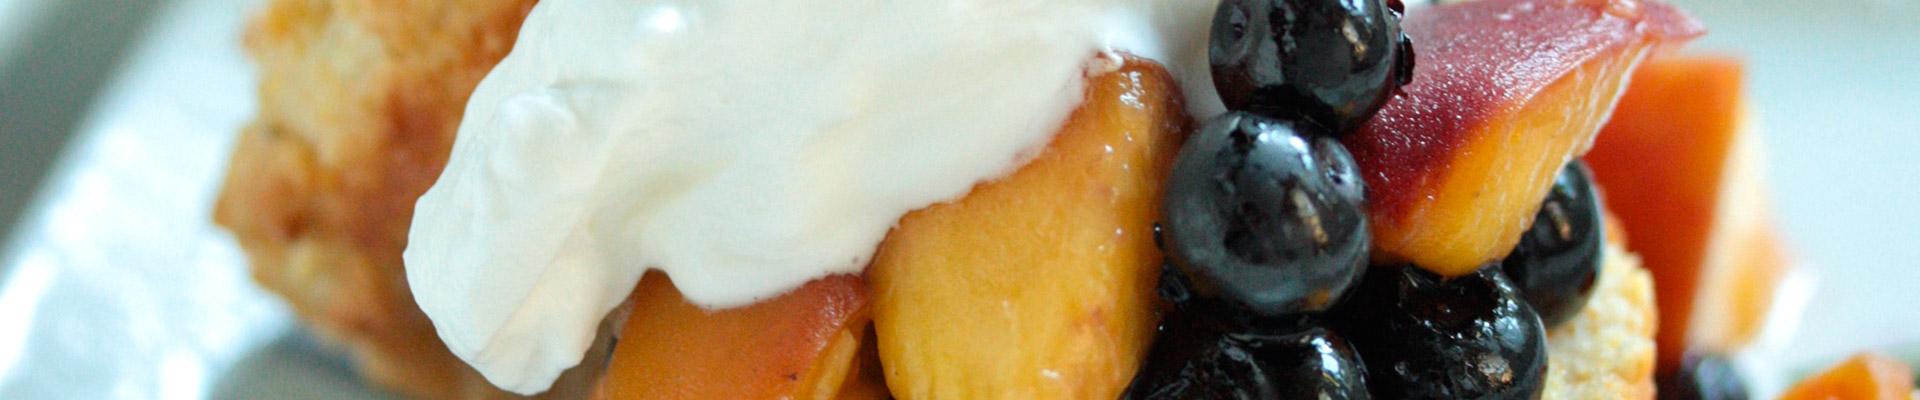 Sweet Corn Meal Rosemary Muffins - #STARFineFoods